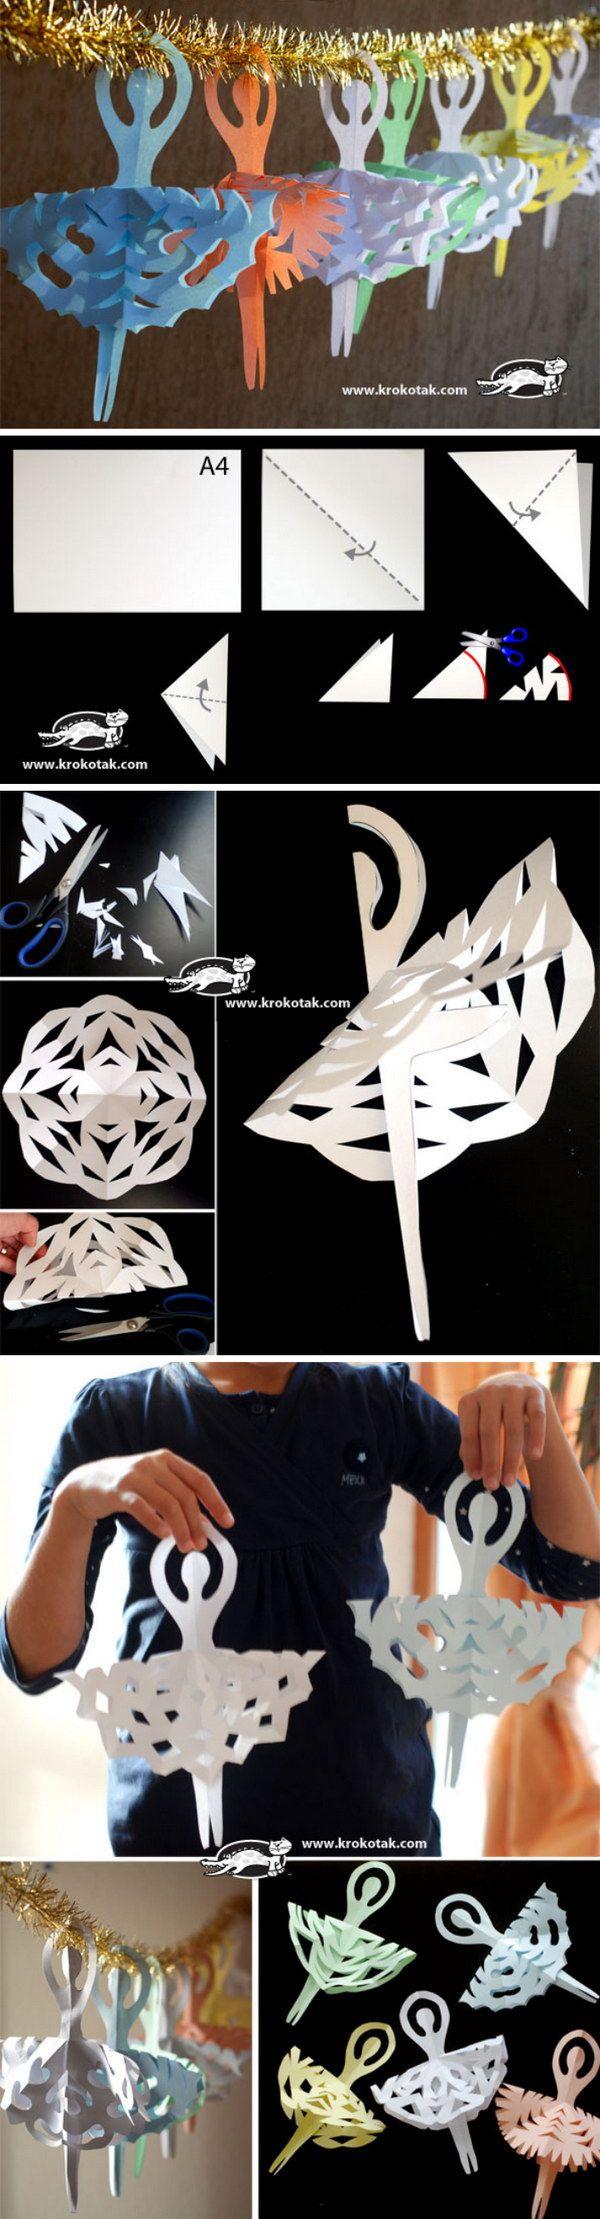 Snowflake Ballerina Ornaments.